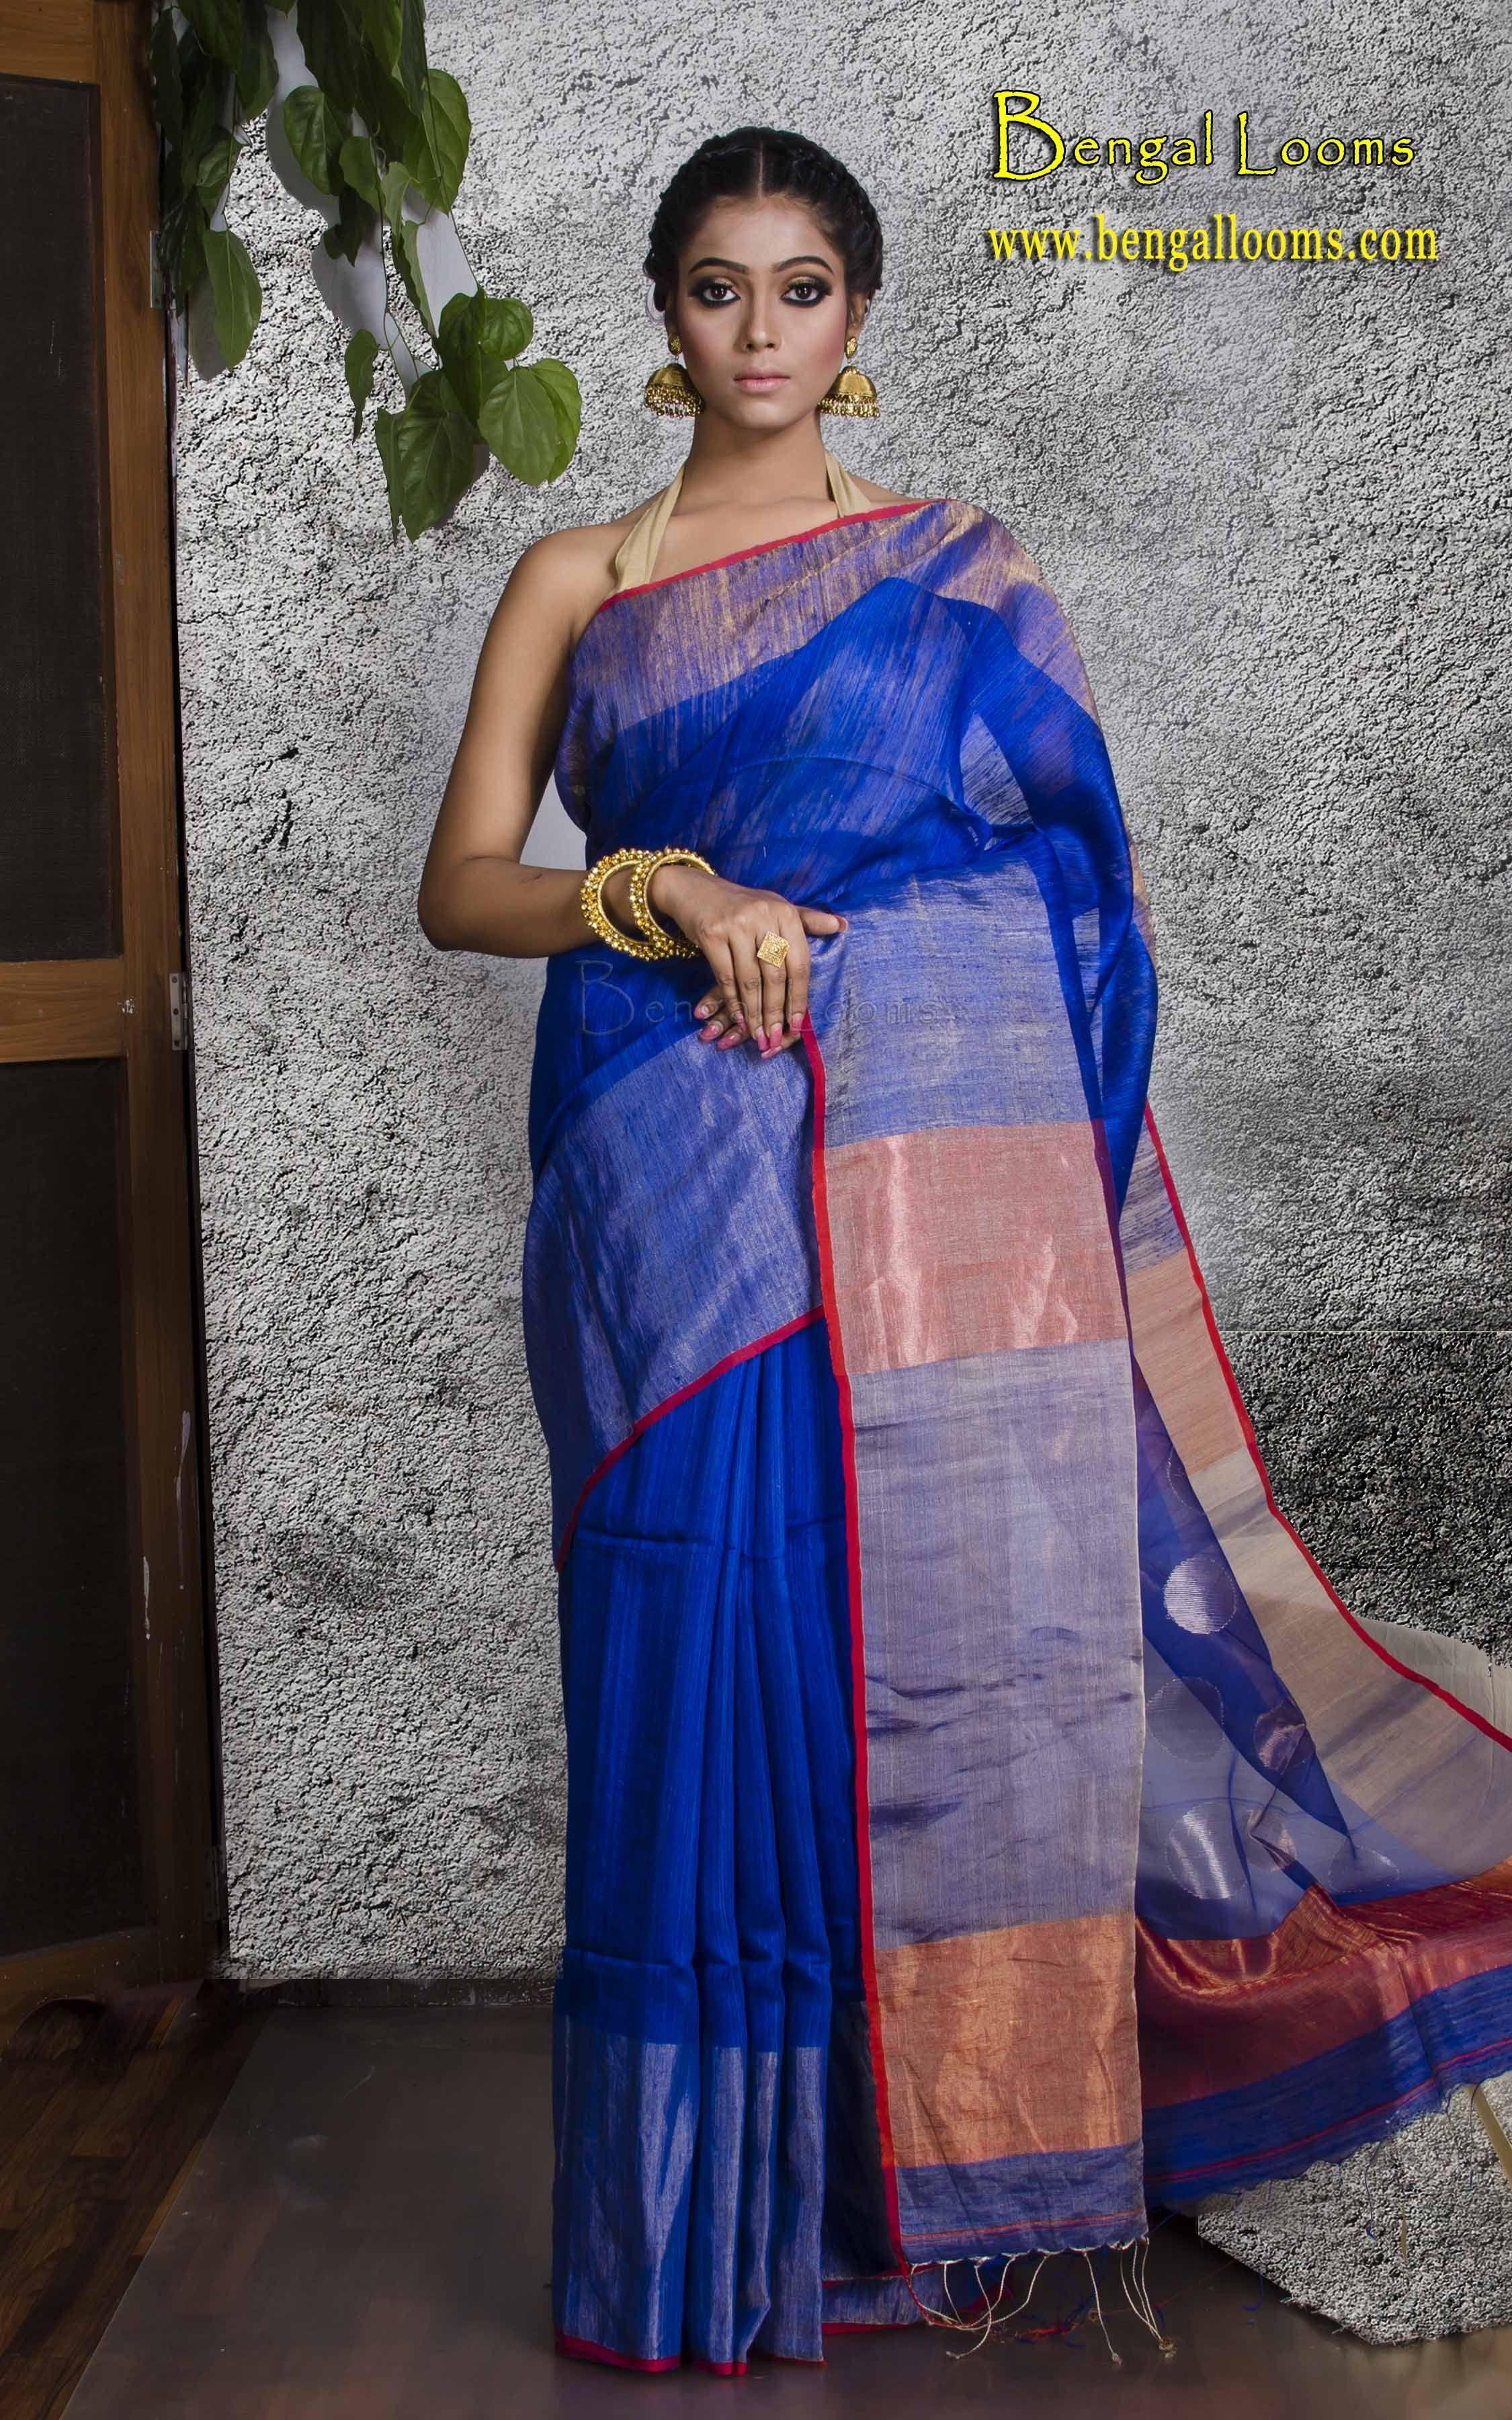 73a4d9bee9 Pure Matka Silk Saree In Royal Blue, Red and Silver   Khadi Sarees ...